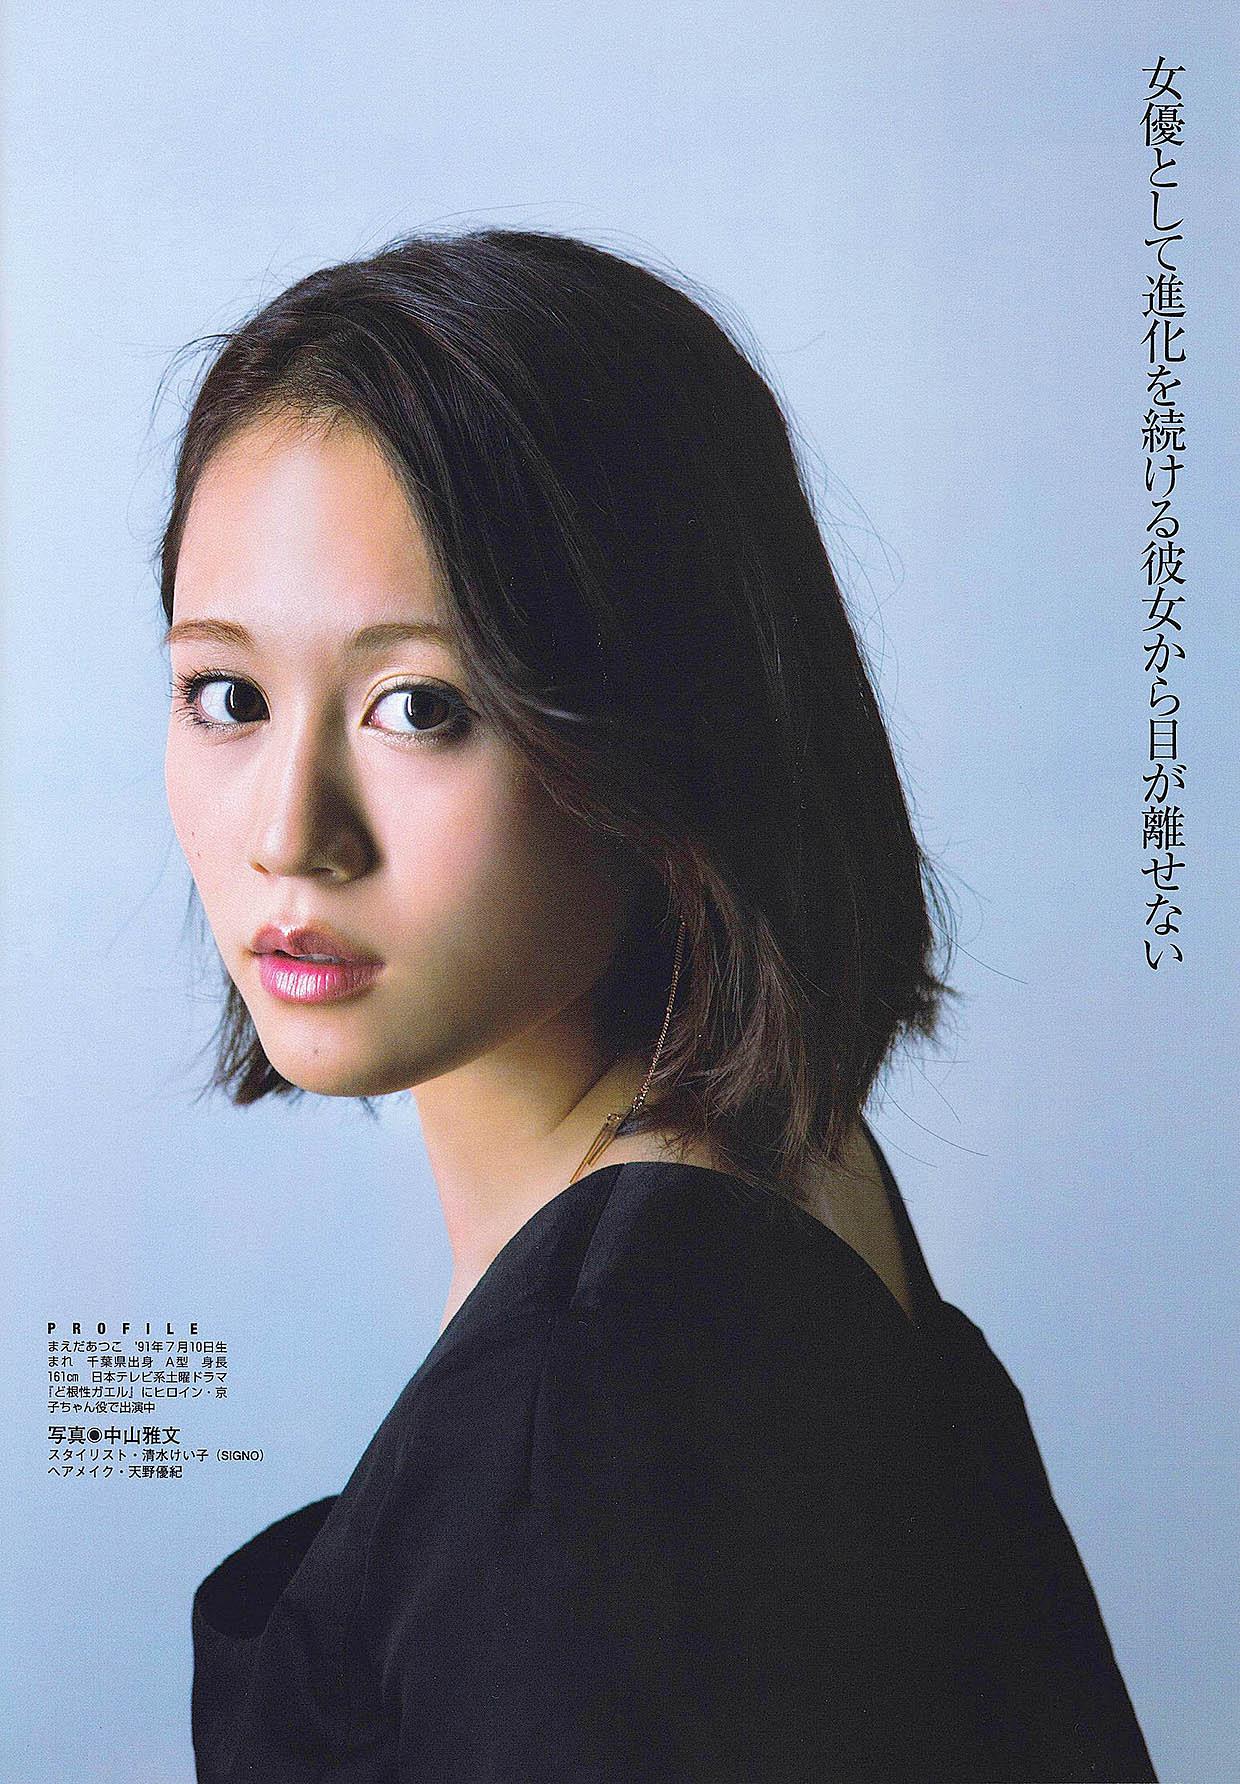 MAtsuko Flash Sp Gravure Best Midsummer 2015 05.jpg